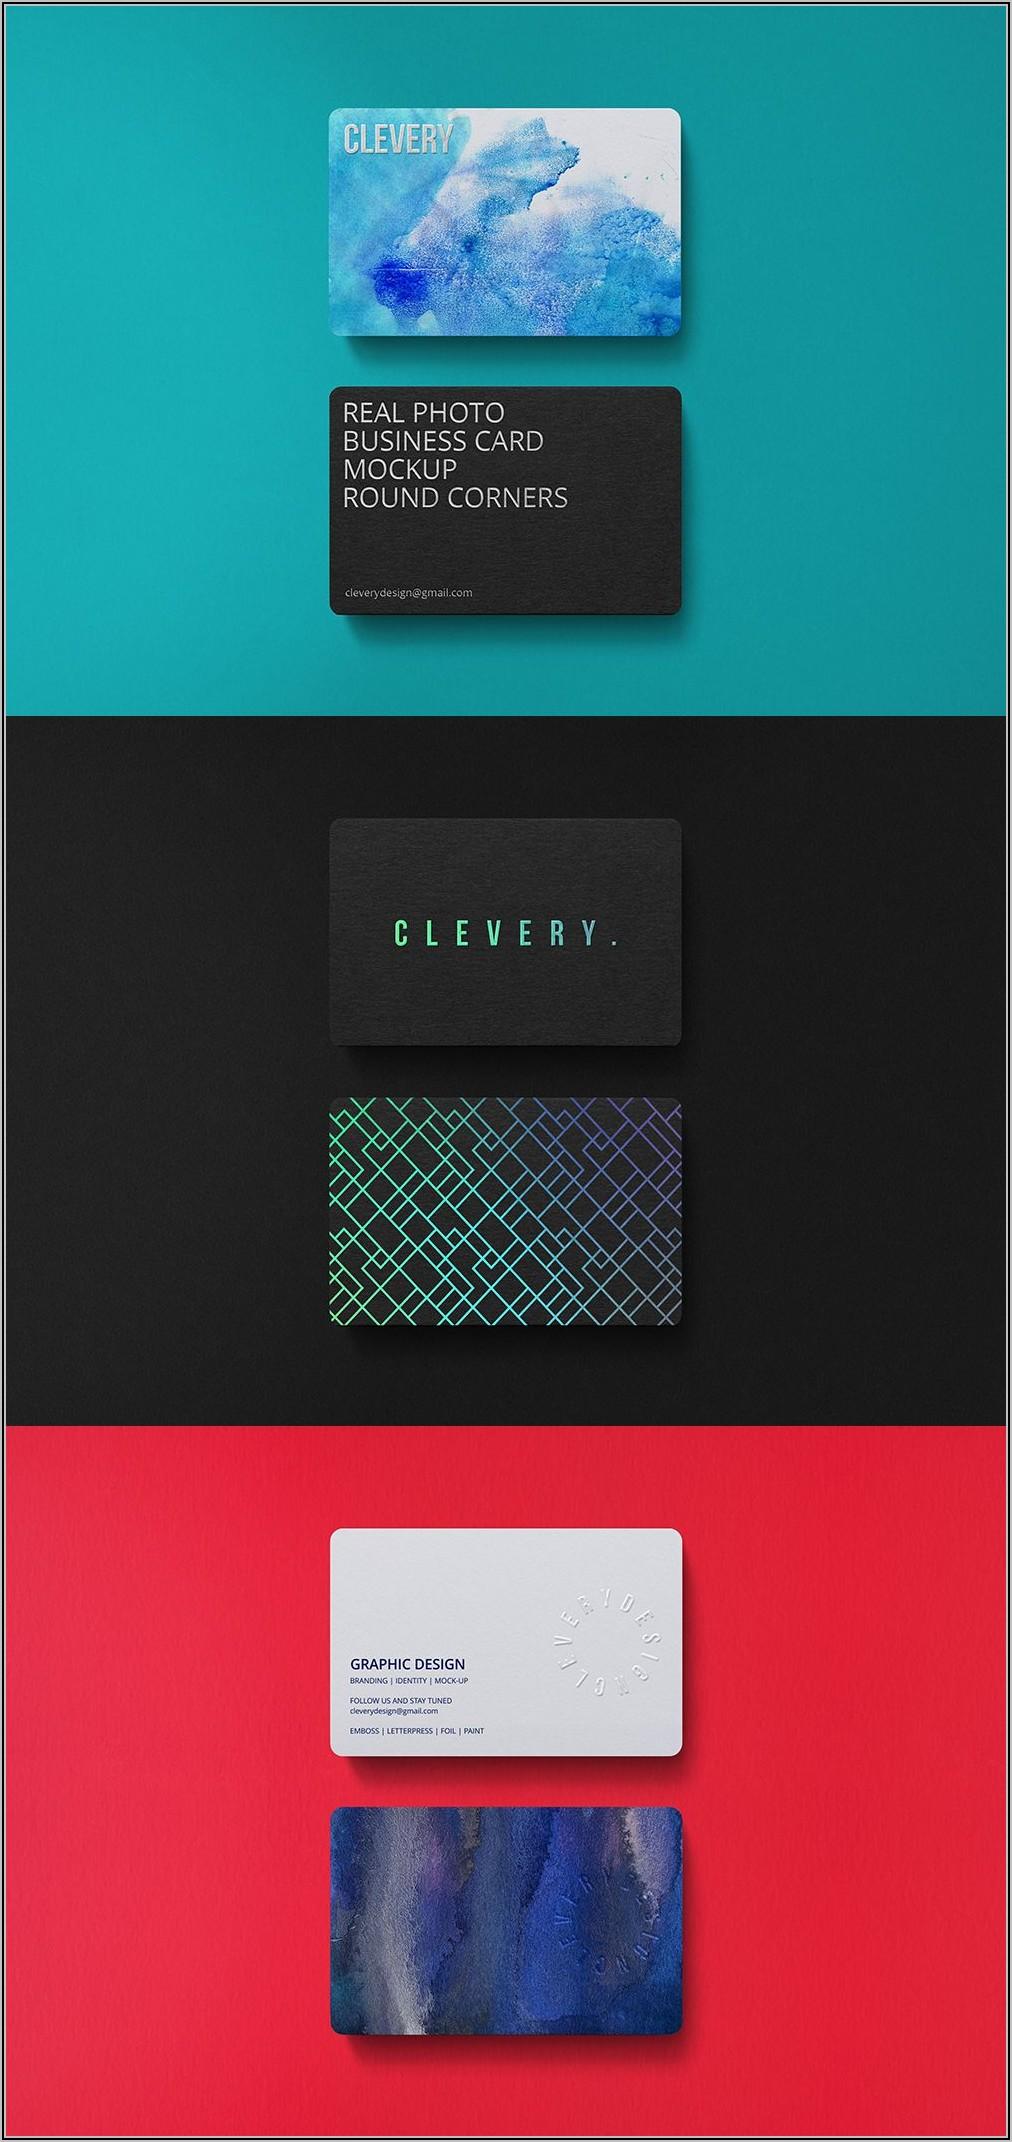 Holographic Foil Business Card Mockup